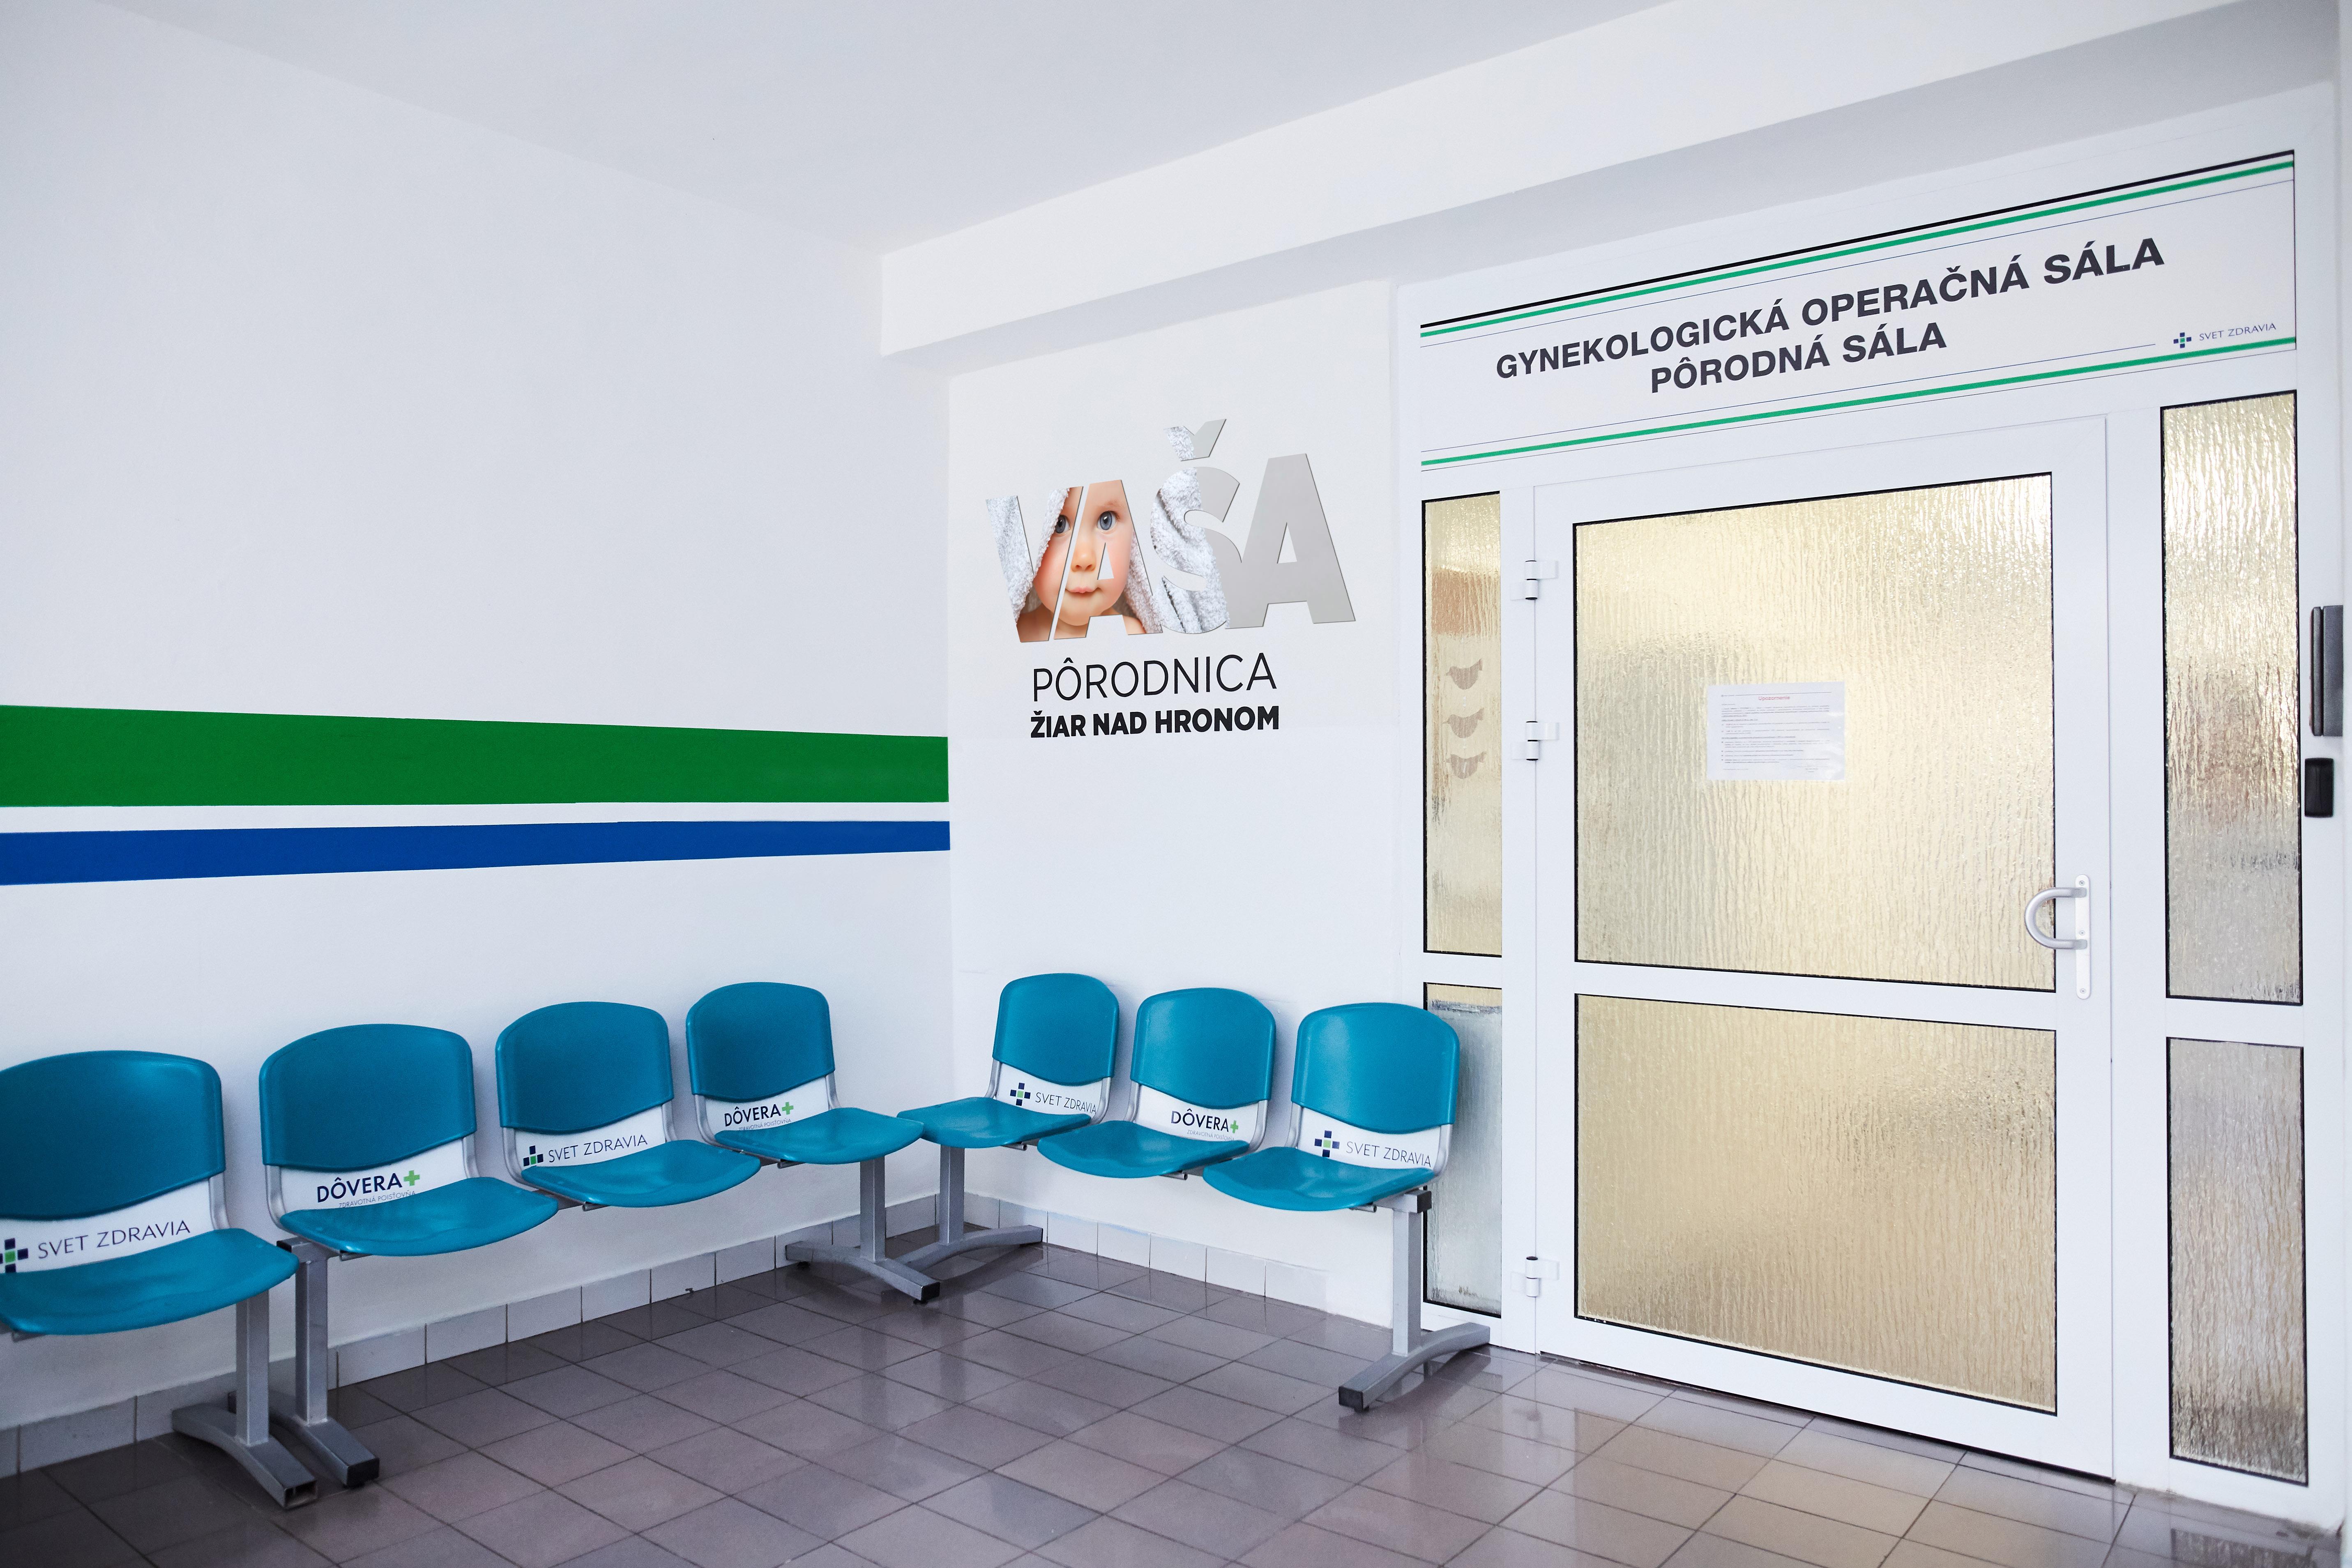 porodnica-svet-zdravia-ziar-nad-hronom - ProCare